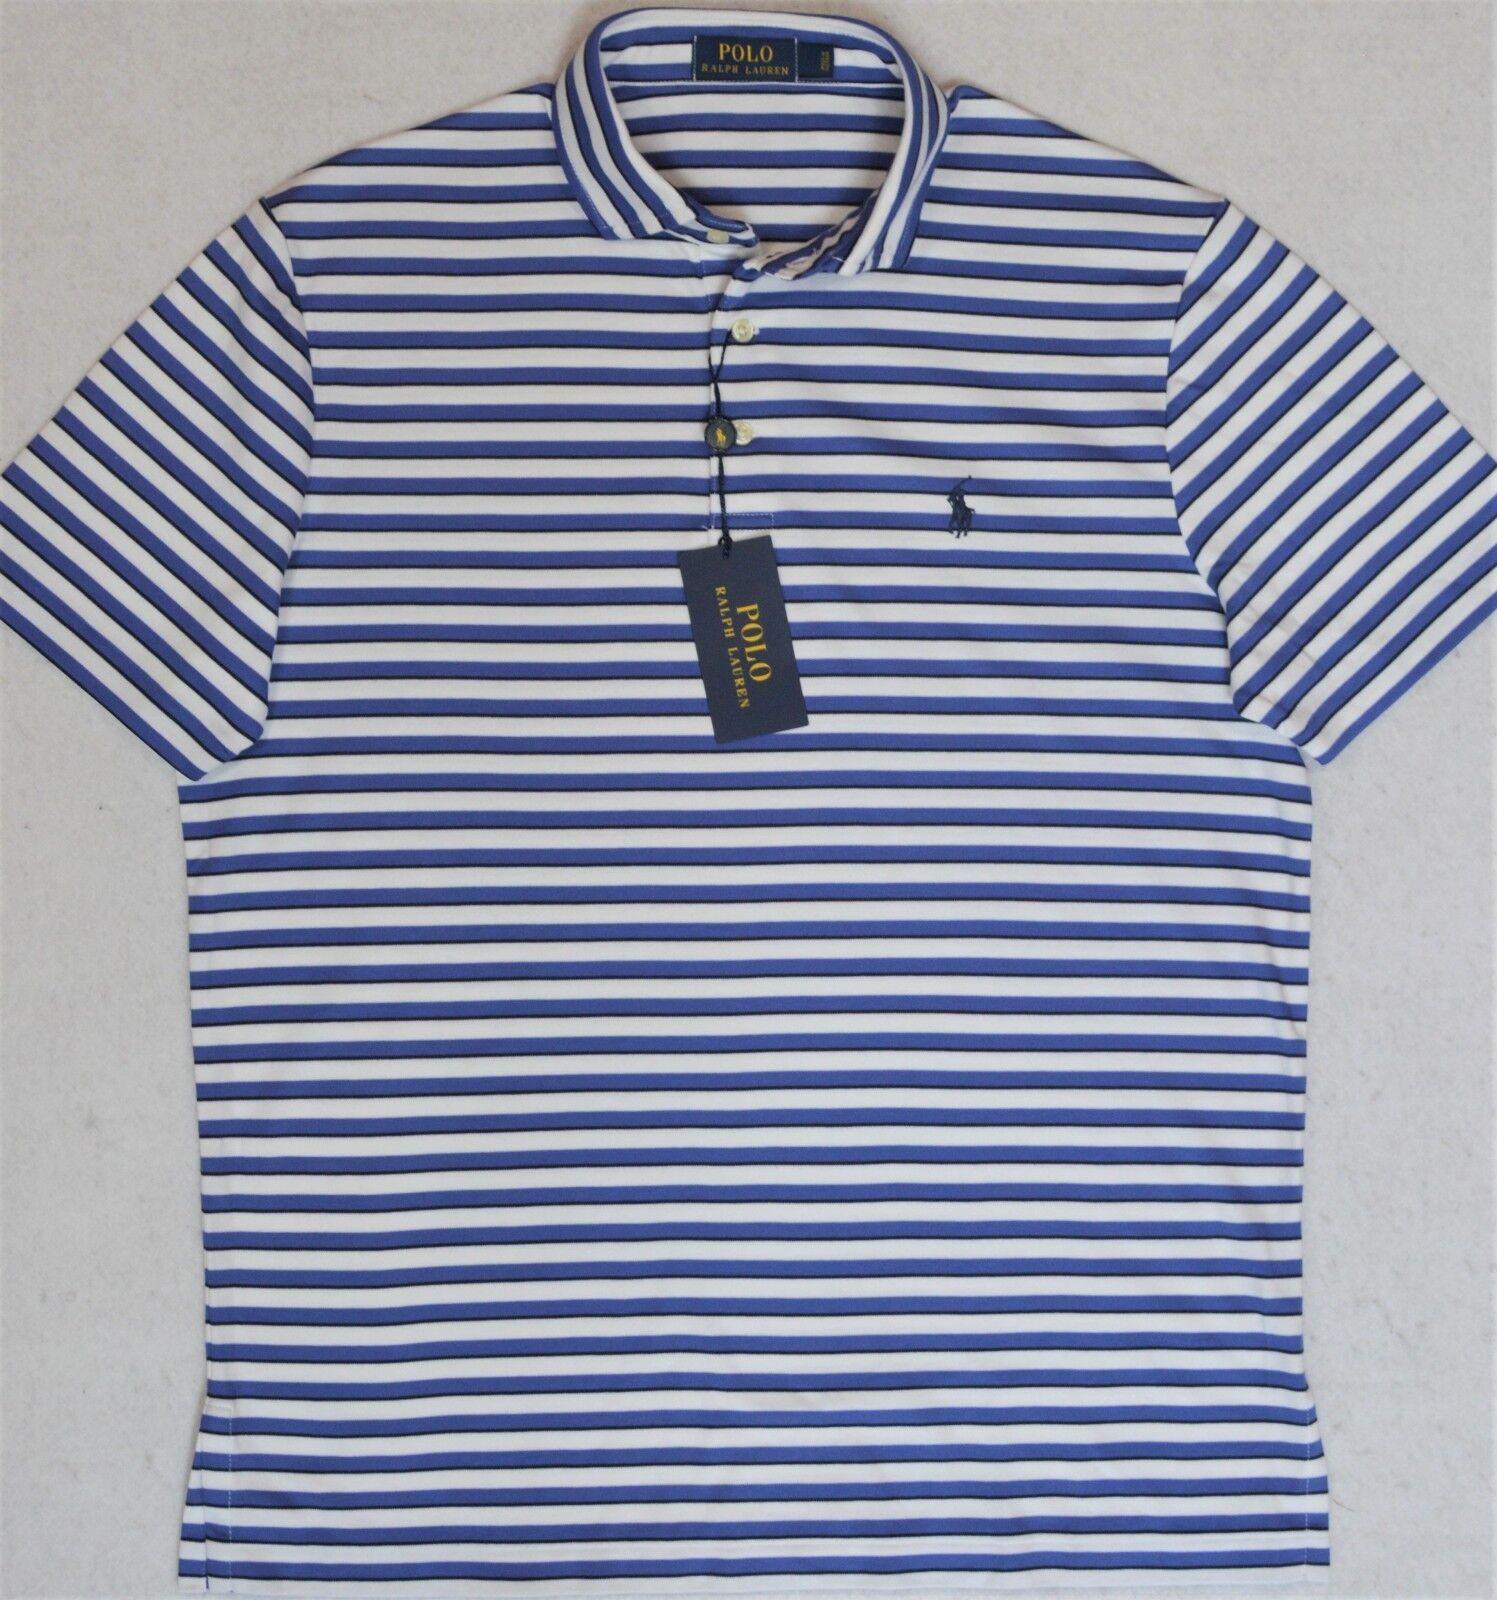 Polo Ralph Lauren Shirt Pima Soft Touch Striped 2XB 2XLT 3XB NWT